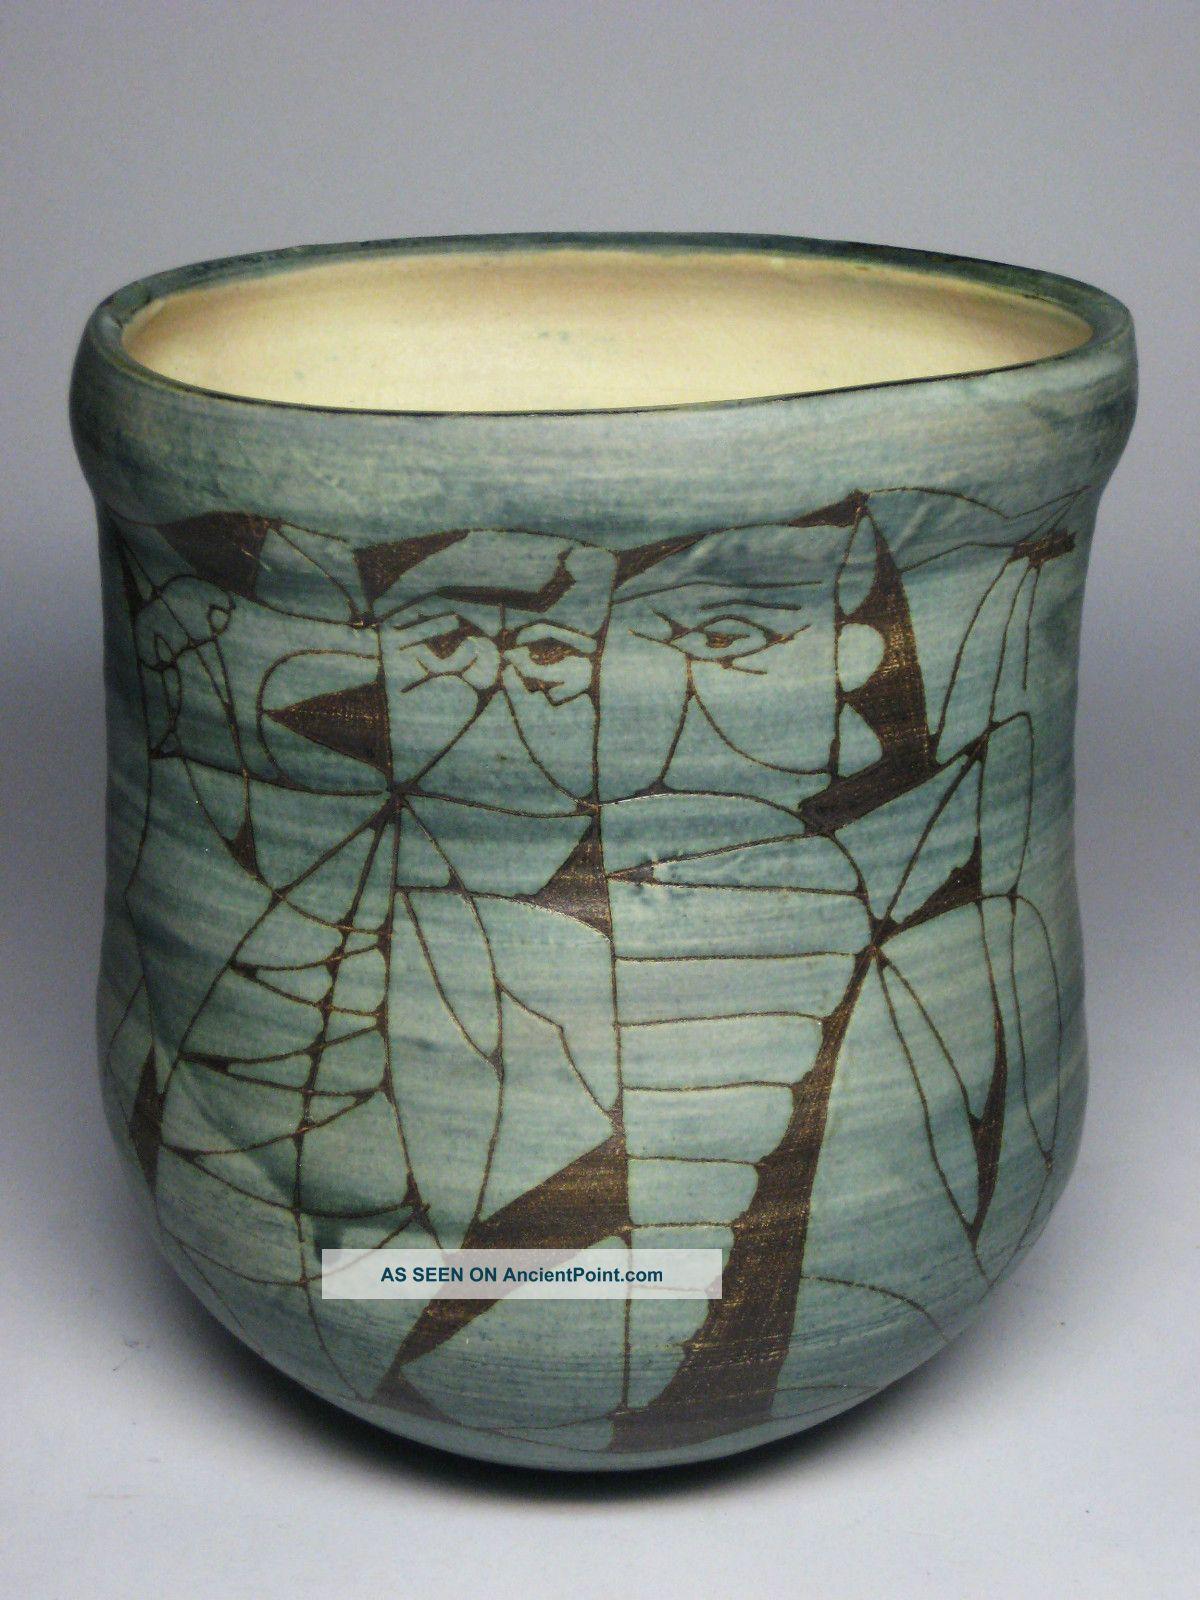 Studio art pottery japanese incised sgraffito etched mid century studio art pottery japanese incised sgraffito etched mid century modern vase vtg mid century modernism reviewsmspy